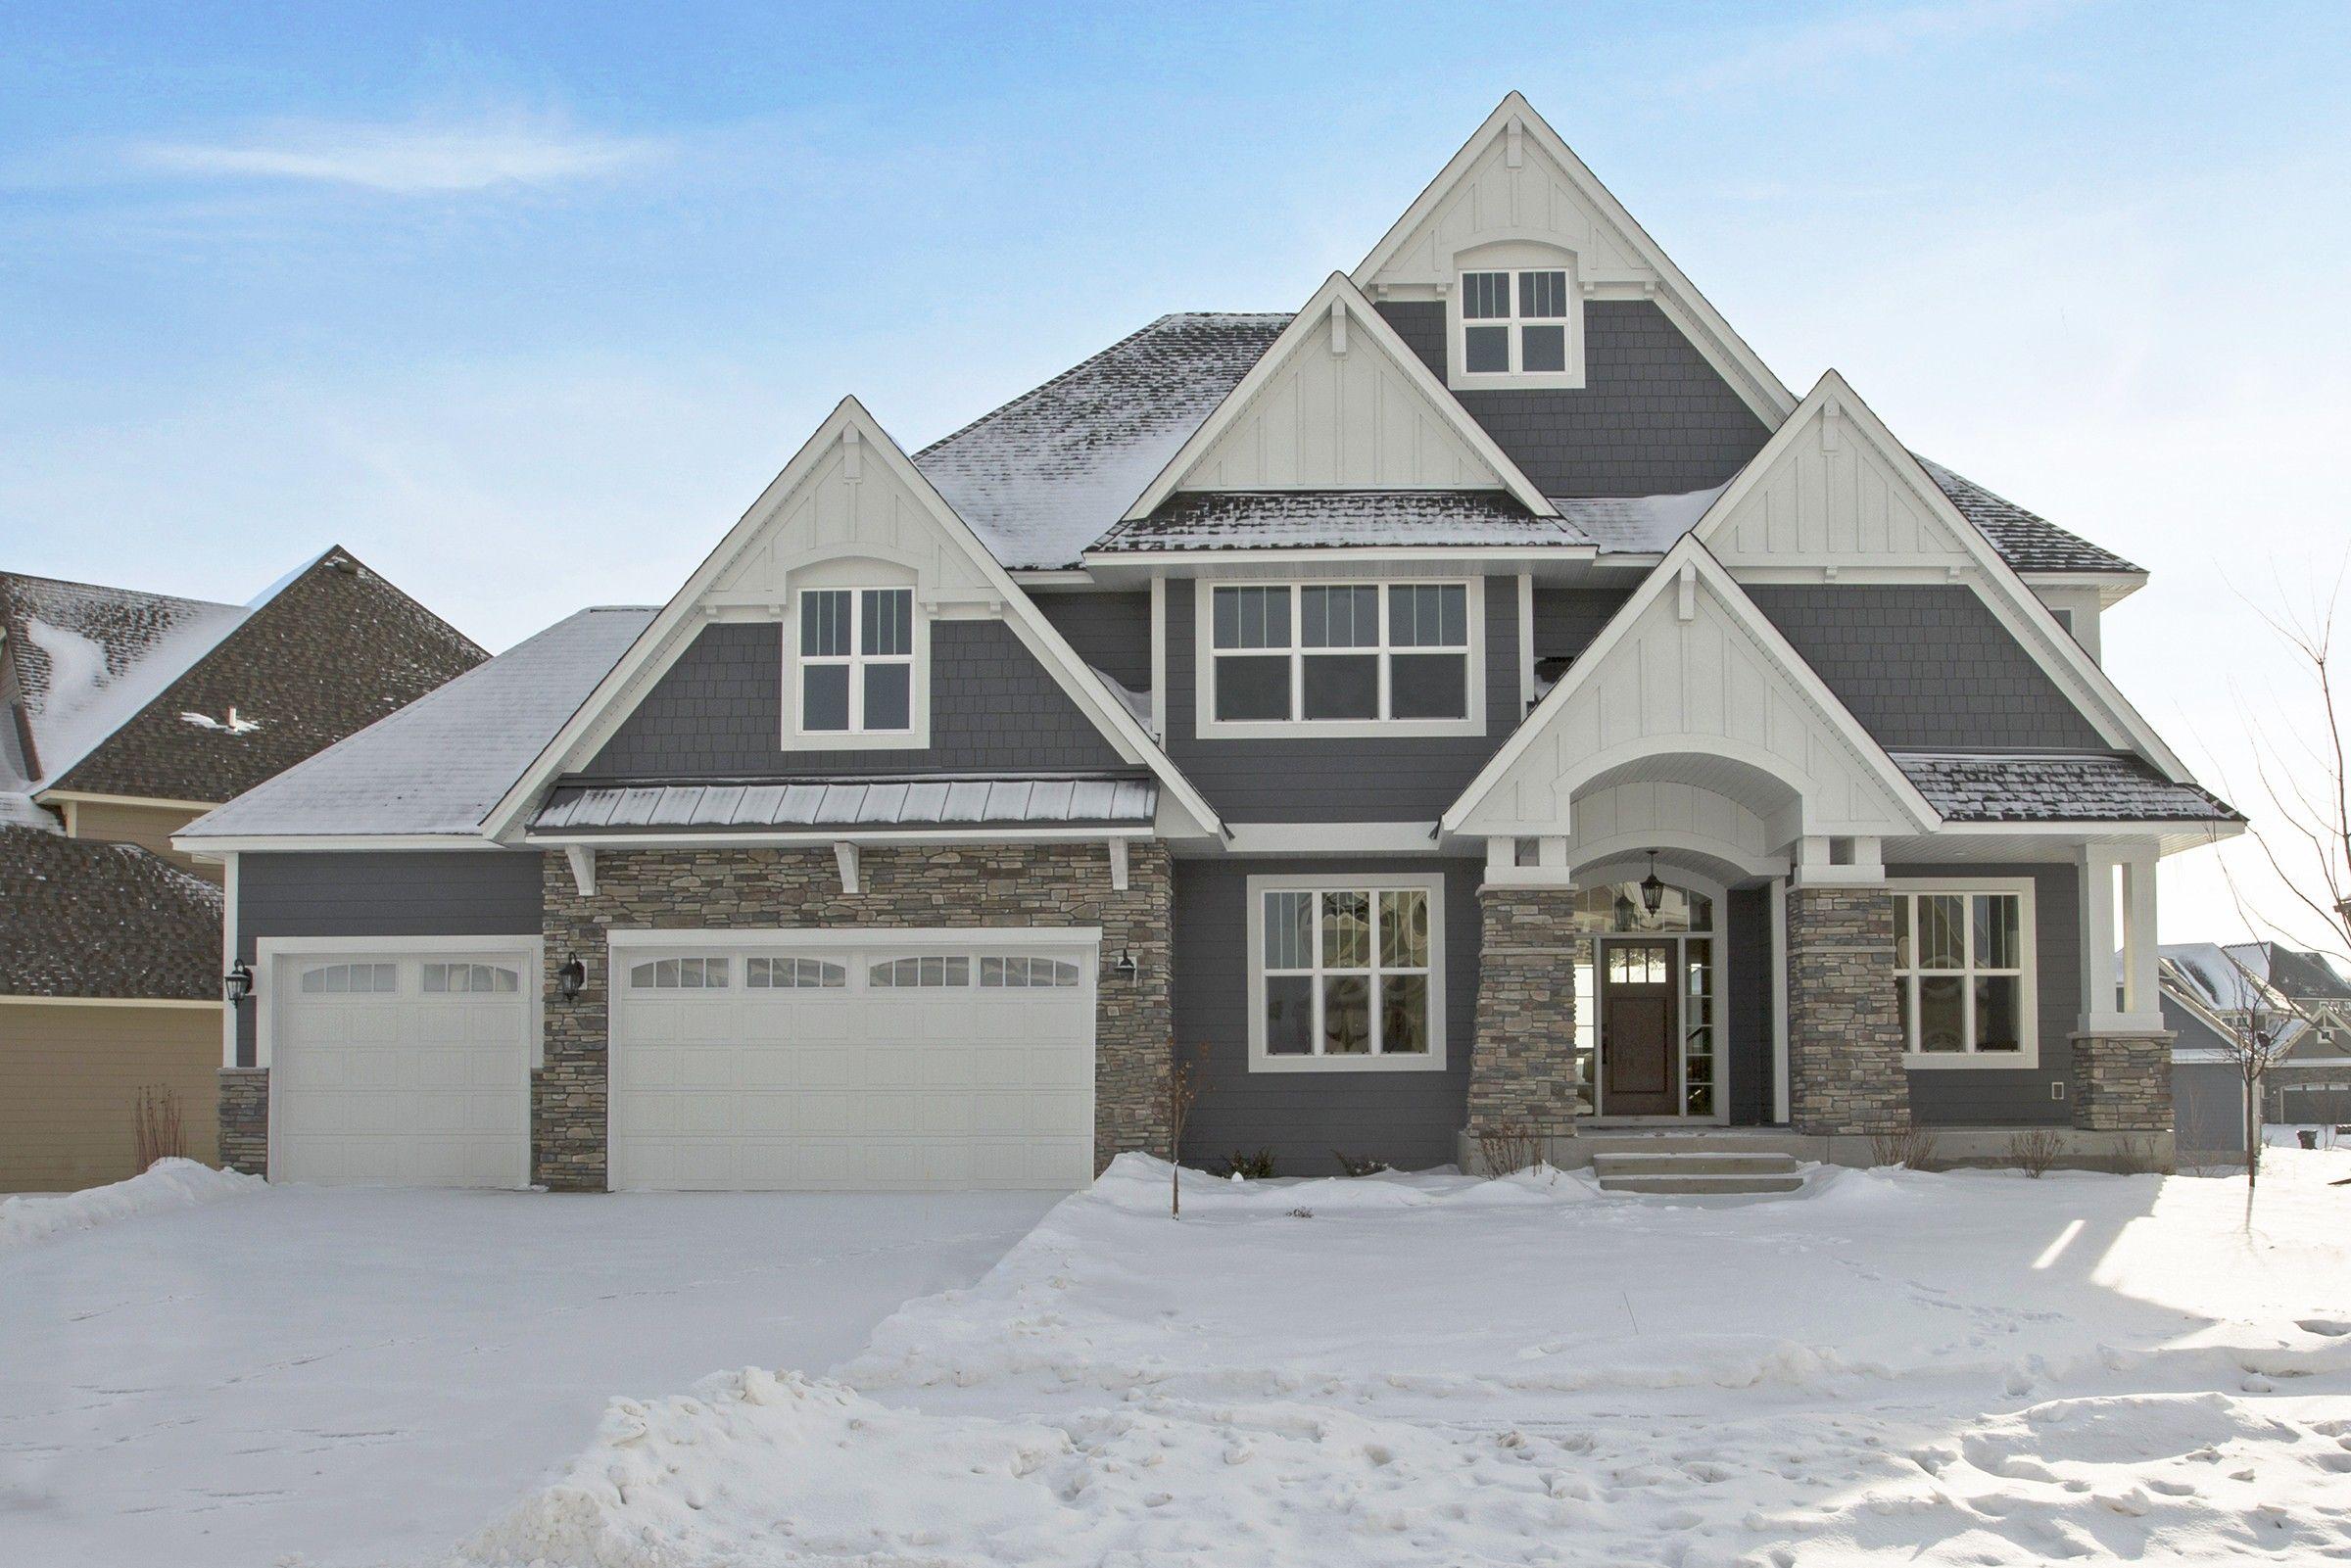 5980 Blackoaks Ln N Plymouth Mn Sold Terra Vista Gray House Exterior House Exterior House Paint Exterior